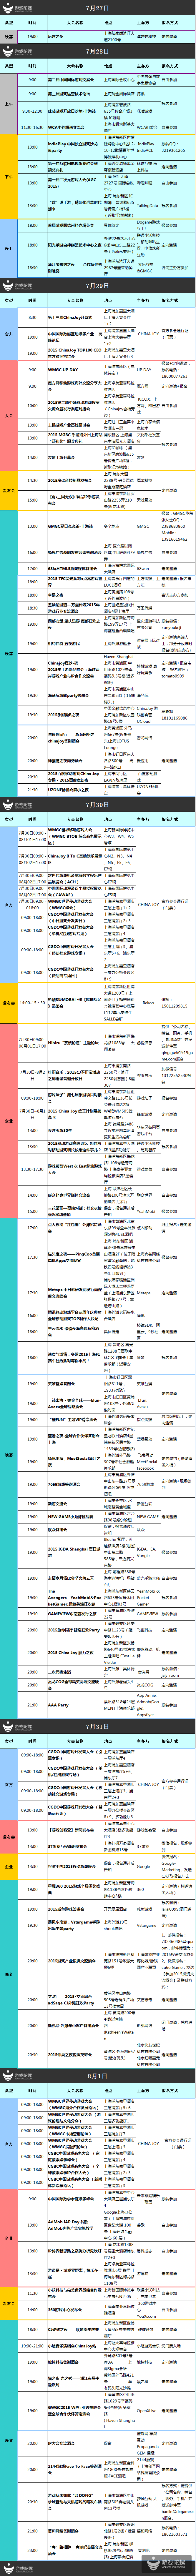 2015 China Joy 跑会指南 | 游戏陀螺(实时更新中...)